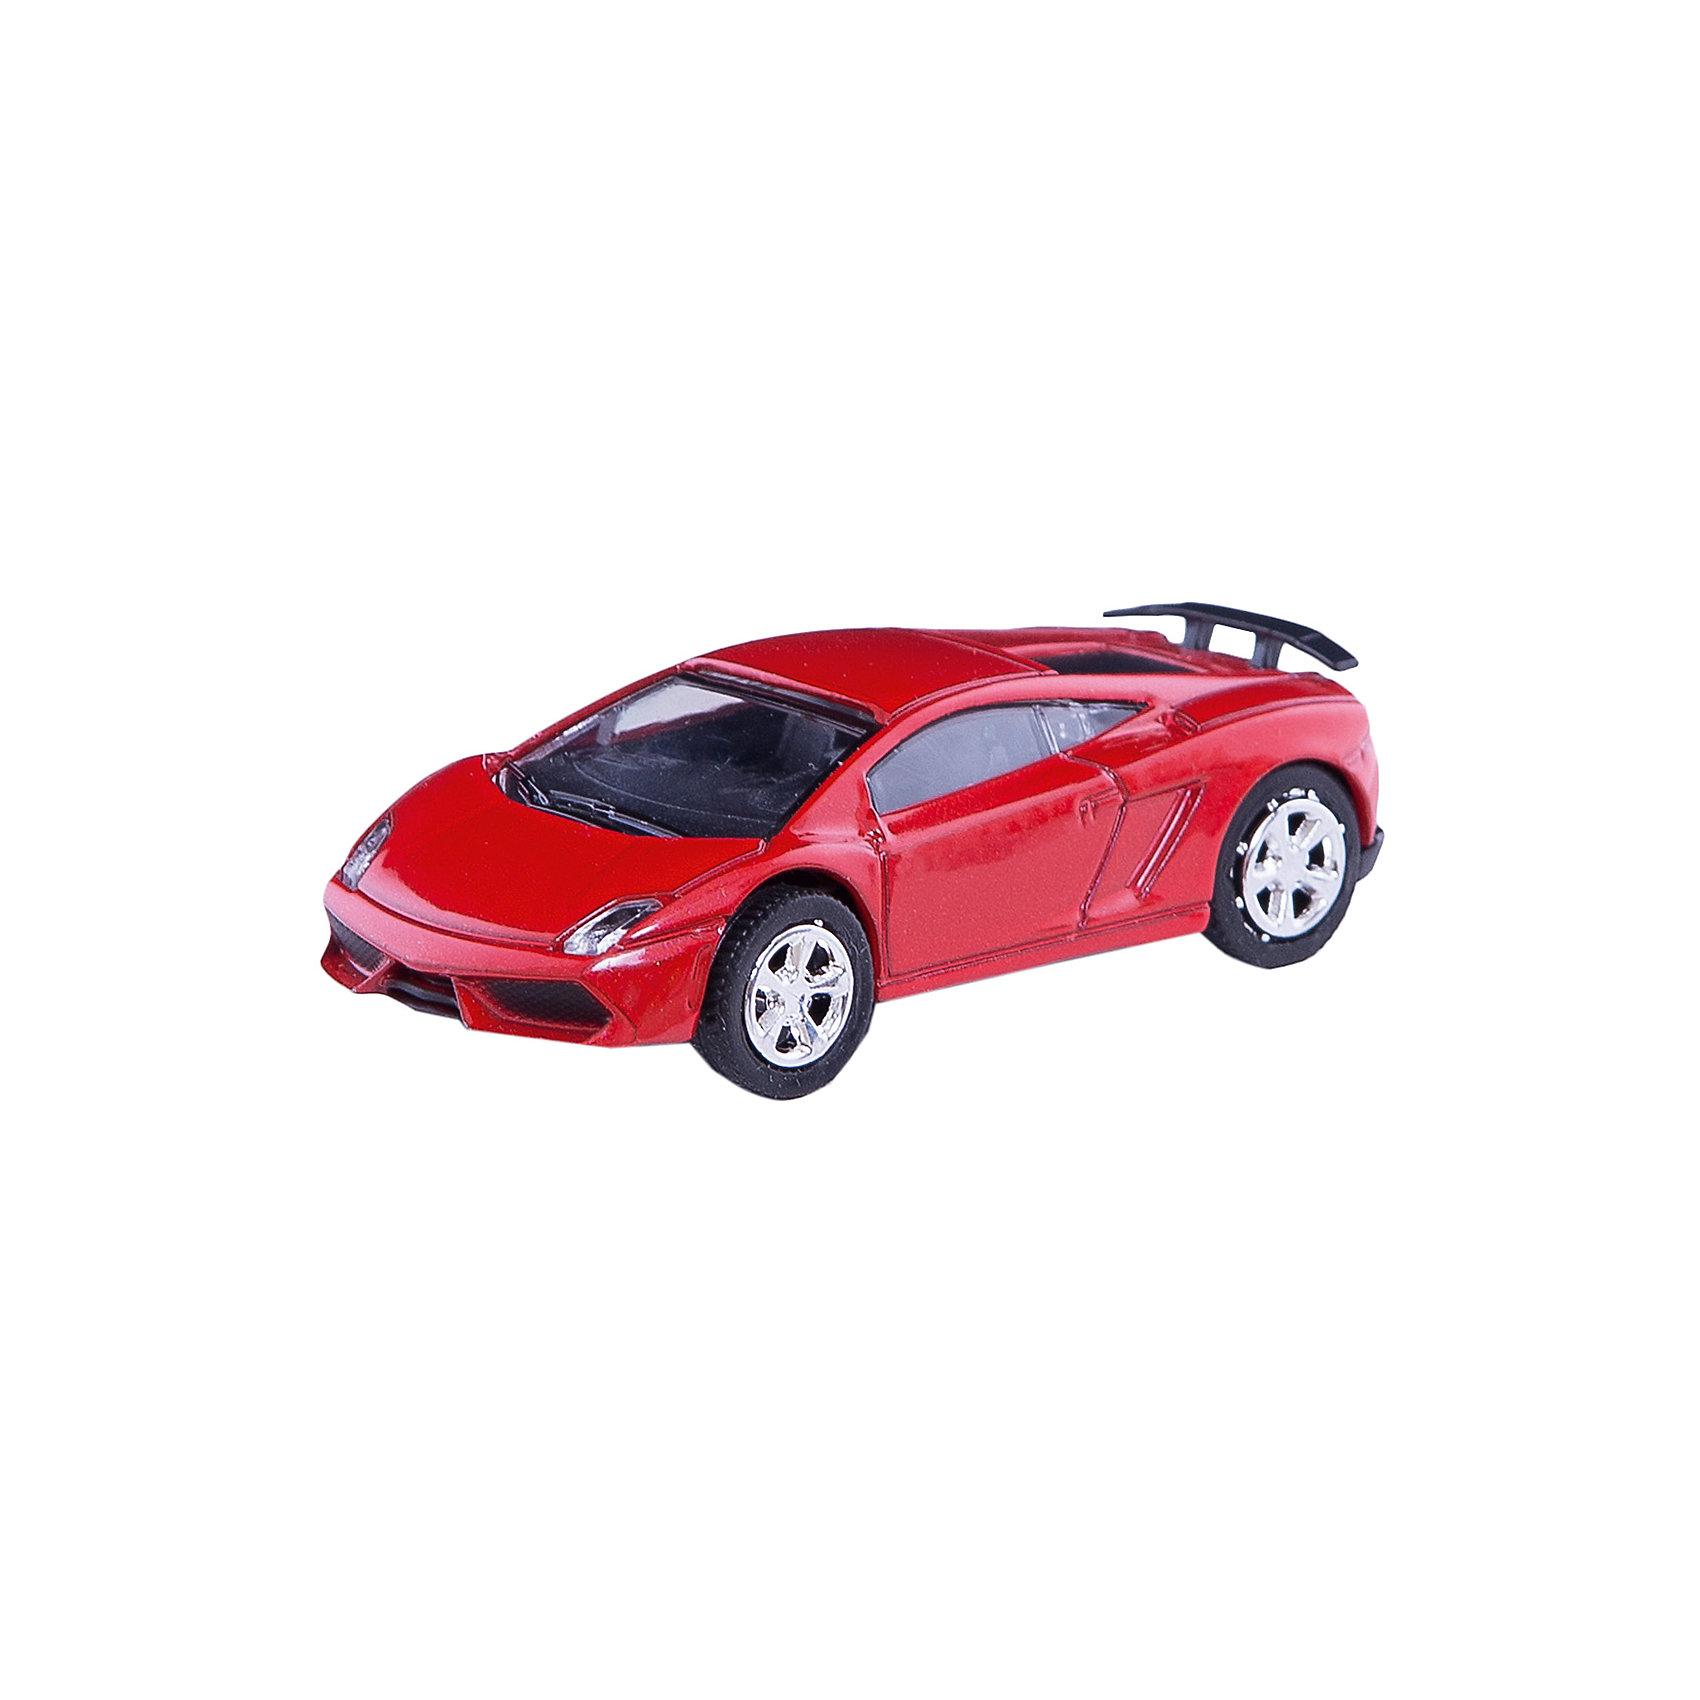 Машинка Italy Extreme Car со светом фар 1:43, AutotimeМашинки<br><br><br>Ширина мм: 165<br>Глубина мм: 57<br>Высота мм: 75<br>Вес г: 13<br>Возраст от месяцев: 36<br>Возраст до месяцев: 2147483647<br>Пол: Мужской<br>Возраст: Детский<br>SKU: 5584036